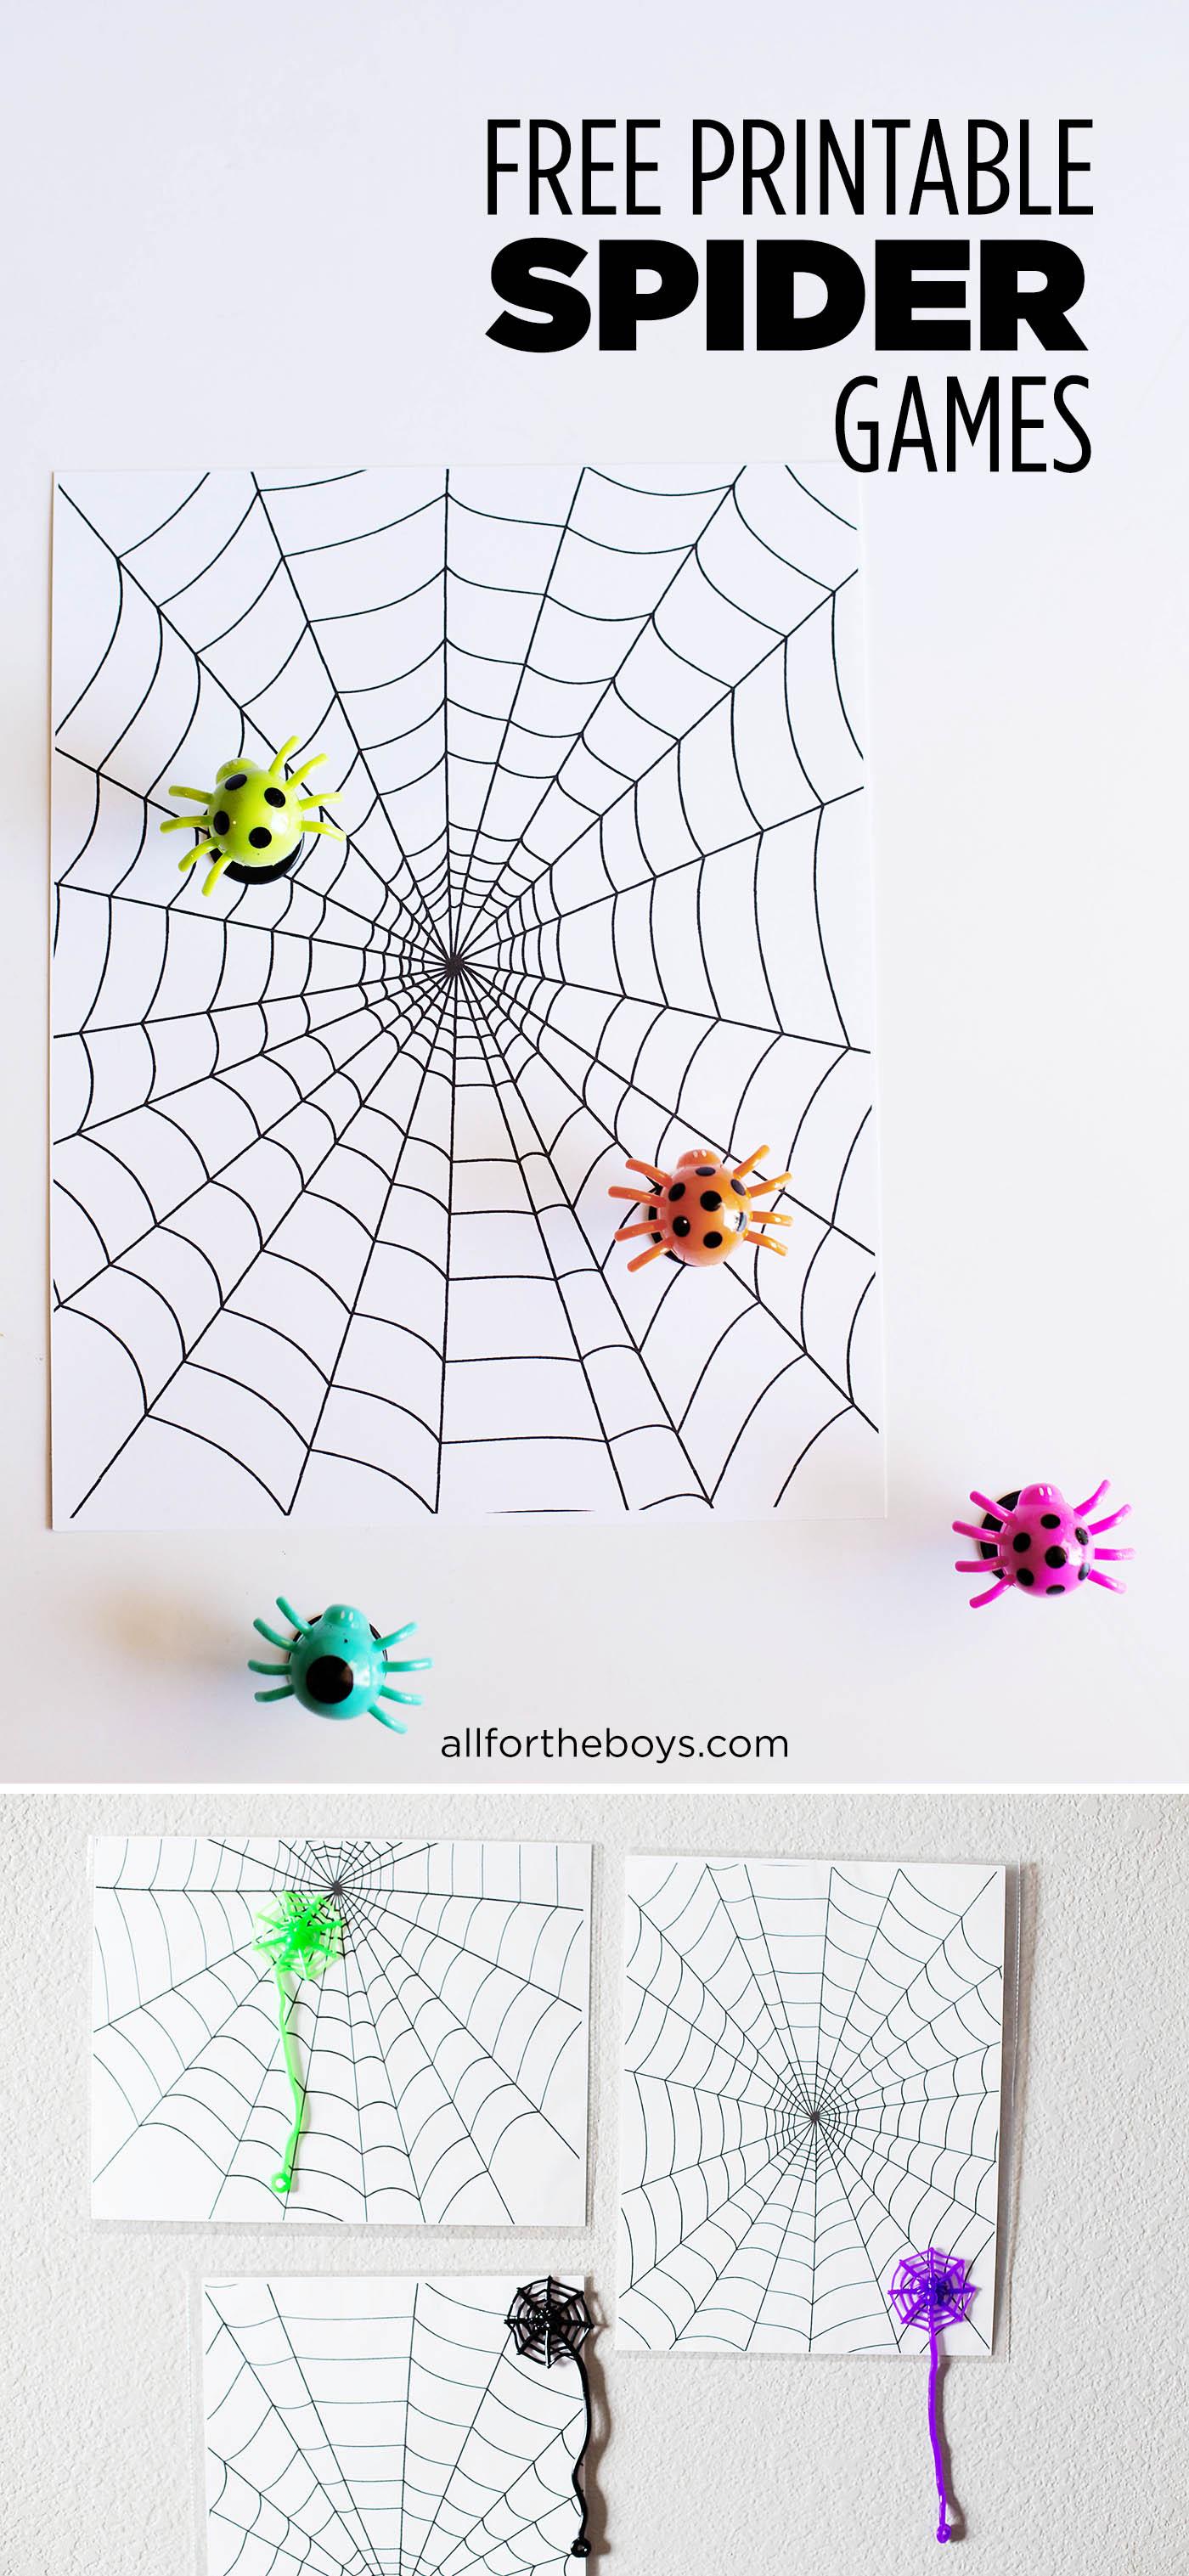 Printable Spider Games